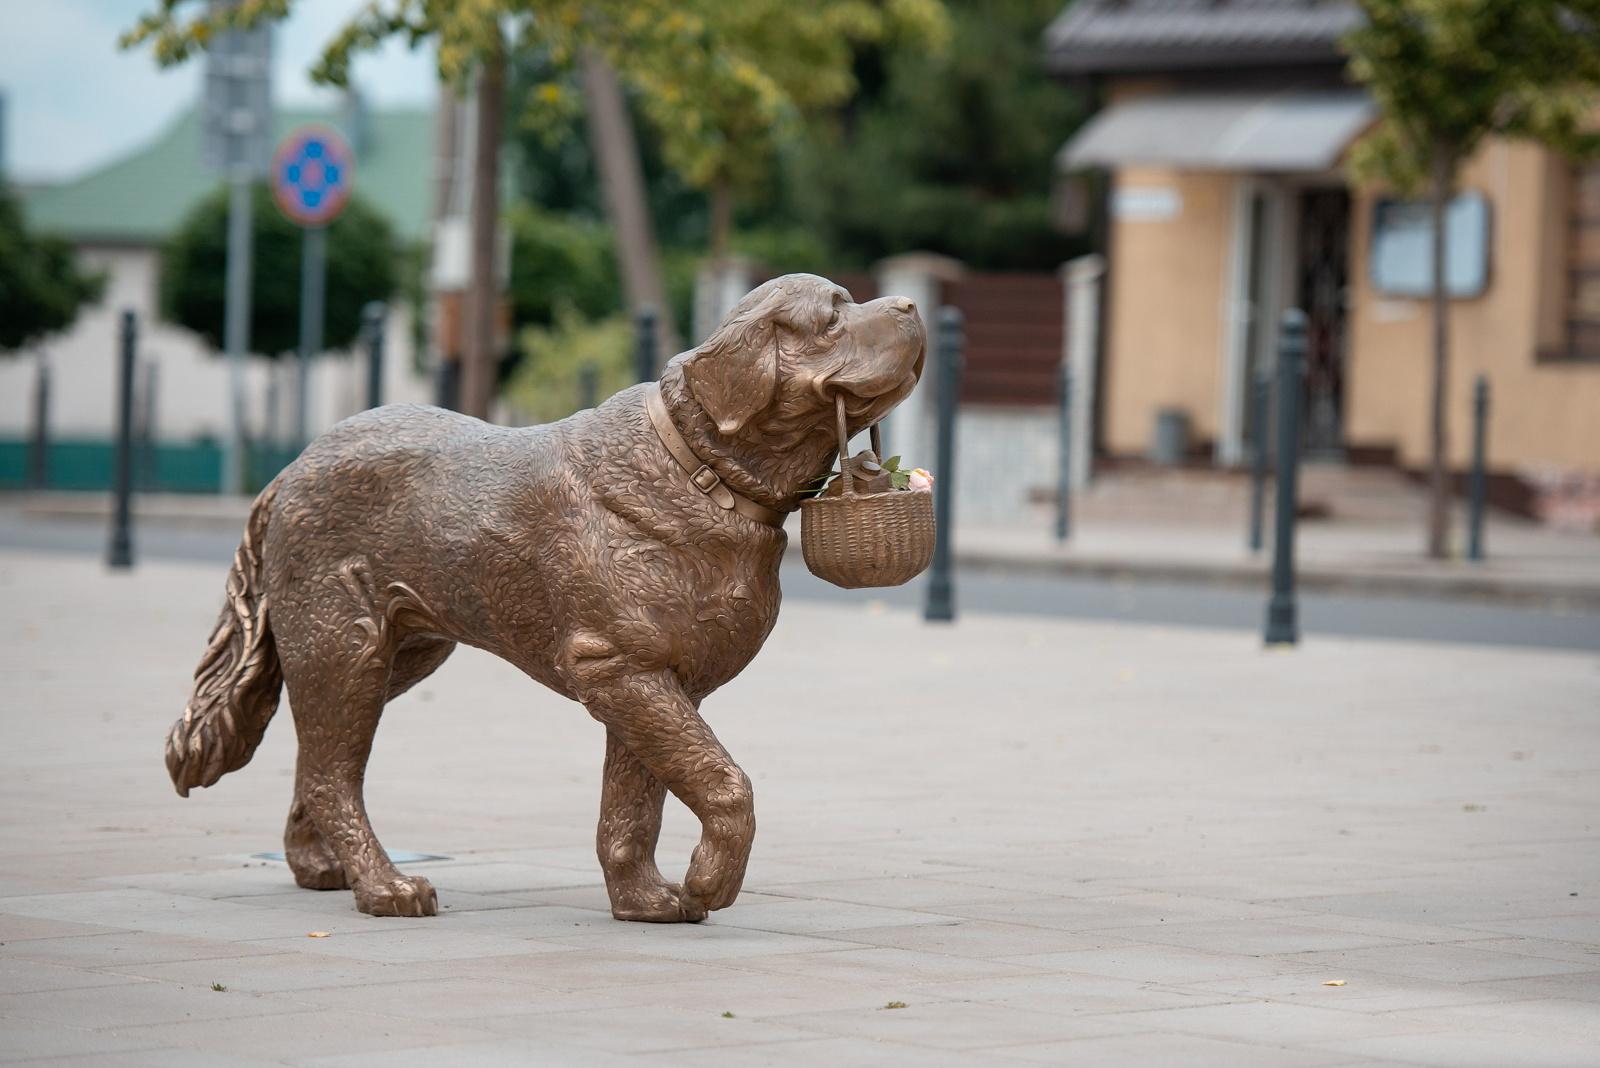 Kaune iškilo legendinei senbernarei Bitei skirta skulptūra